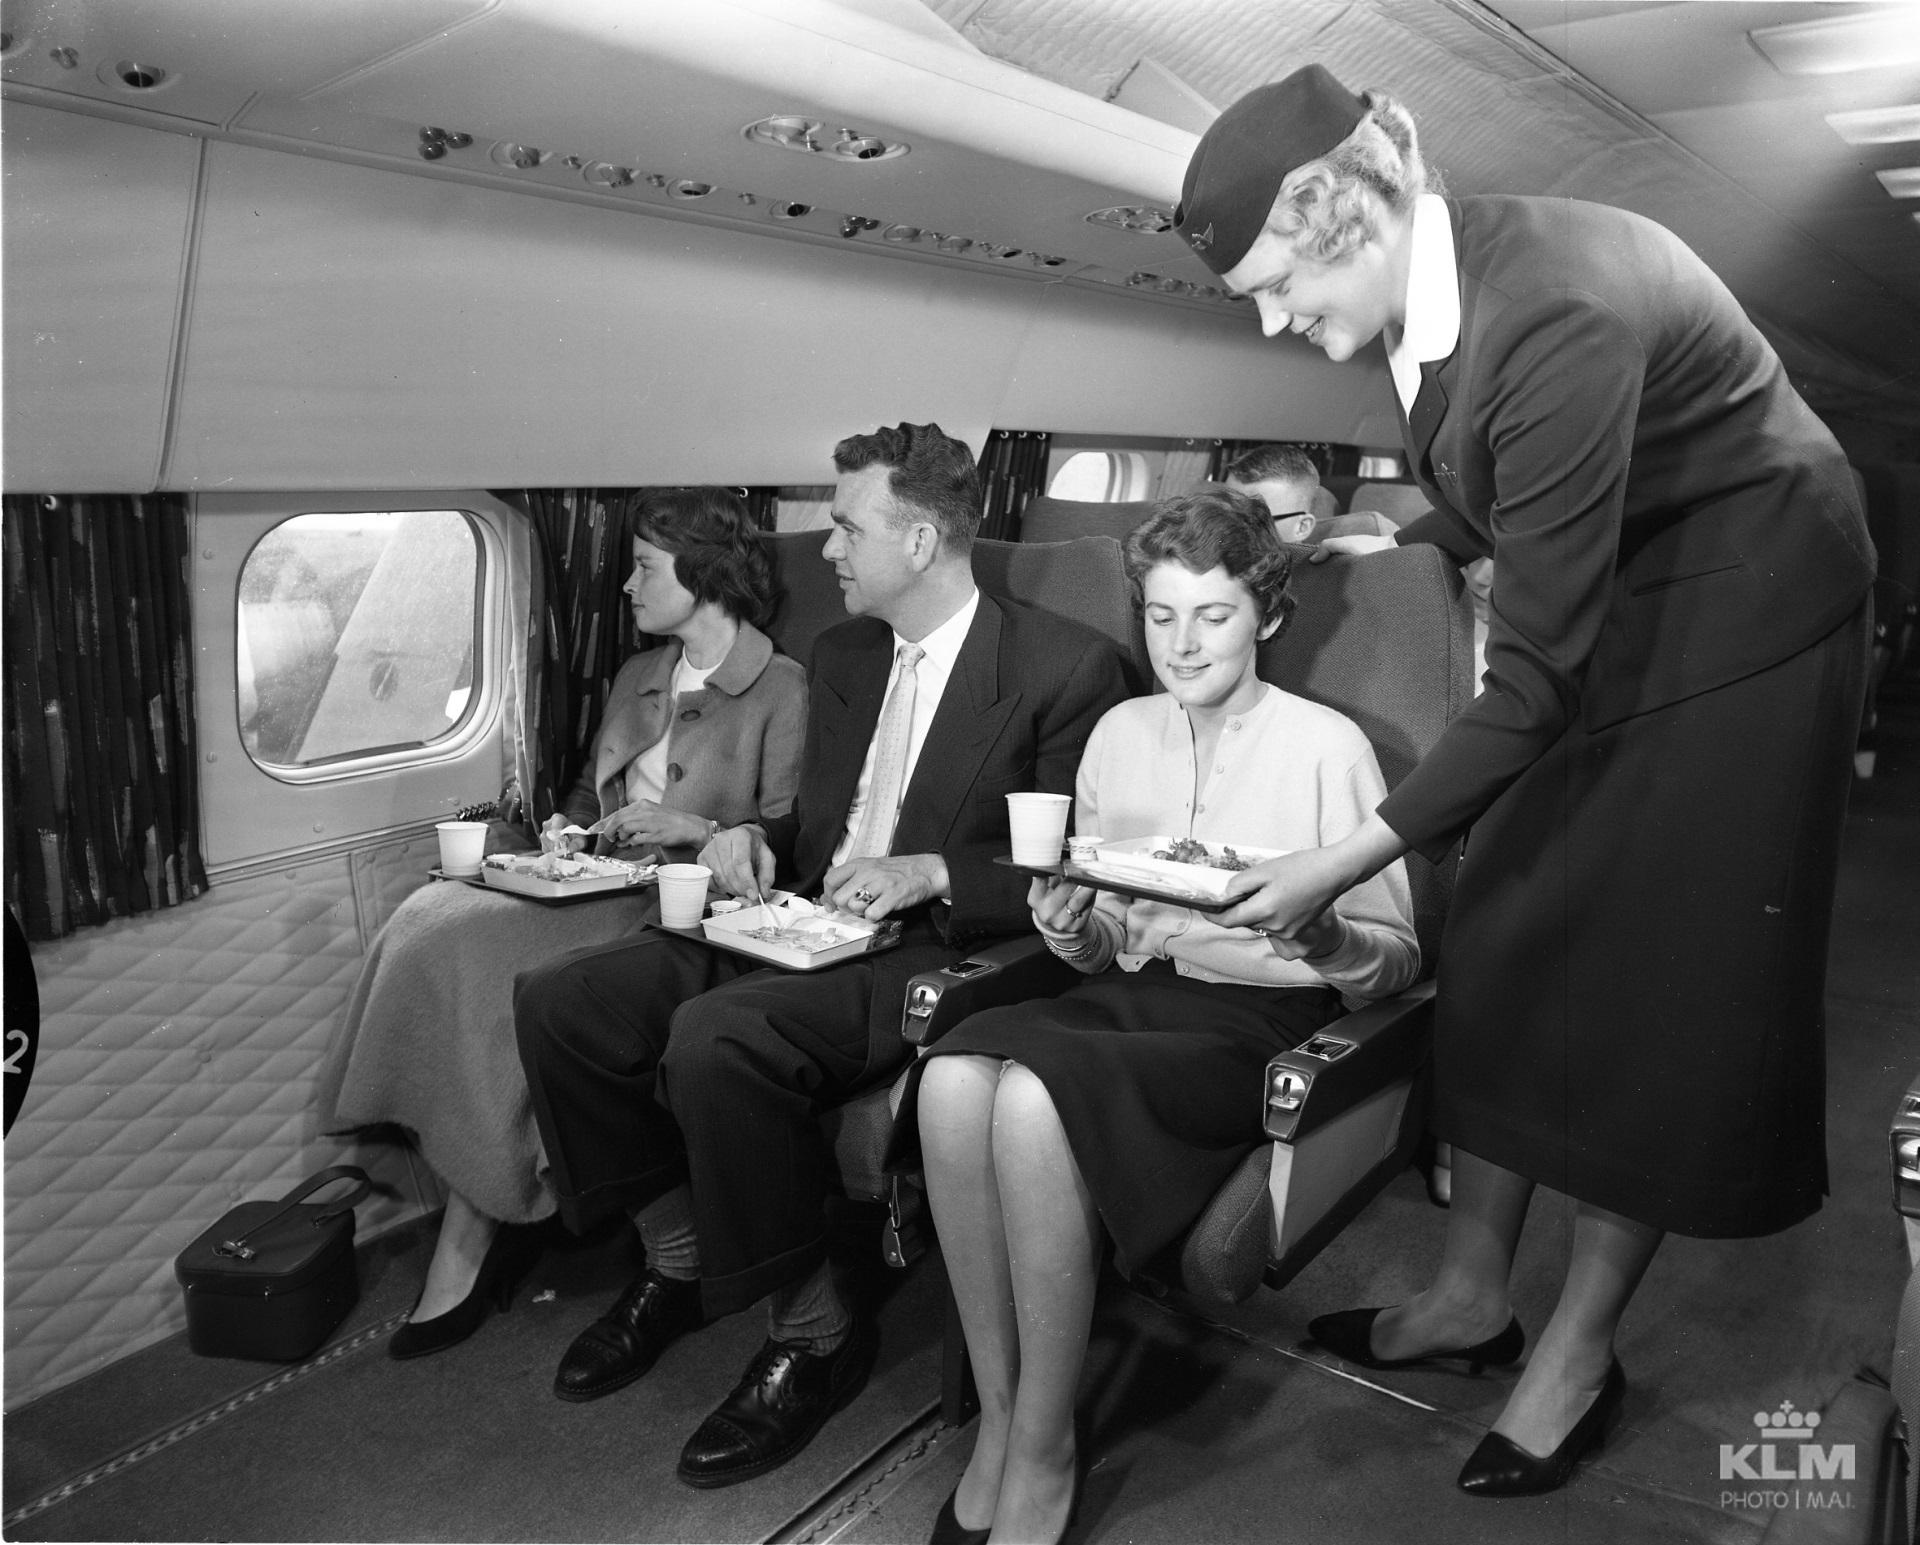 KLM_Economy Class_1958_inflight service